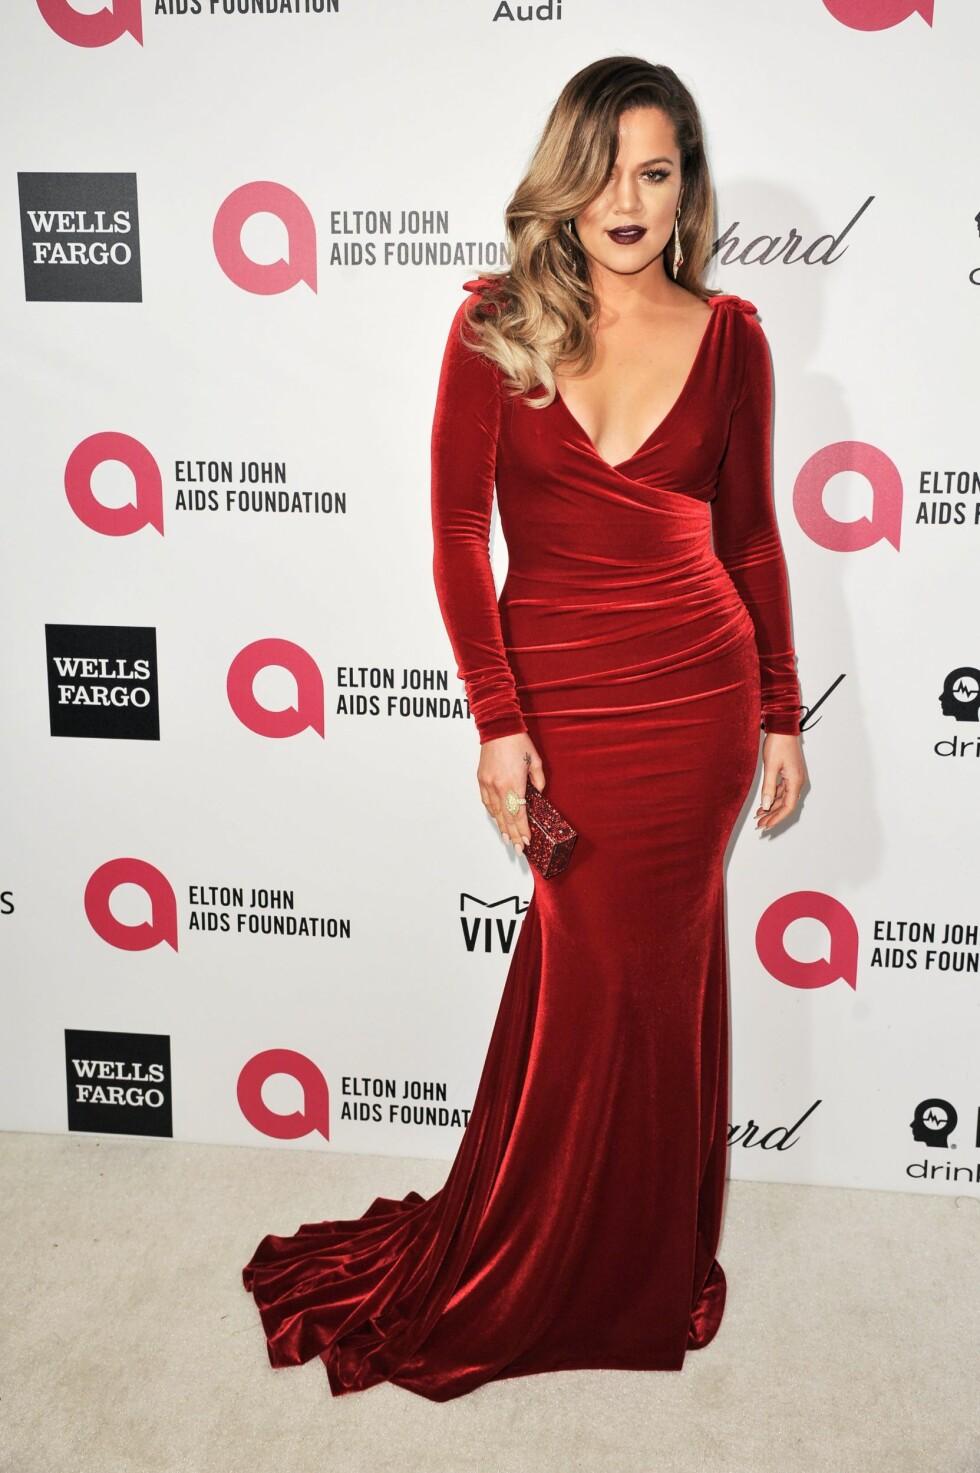 2014: Khloé Kardashian Foto: INVISION